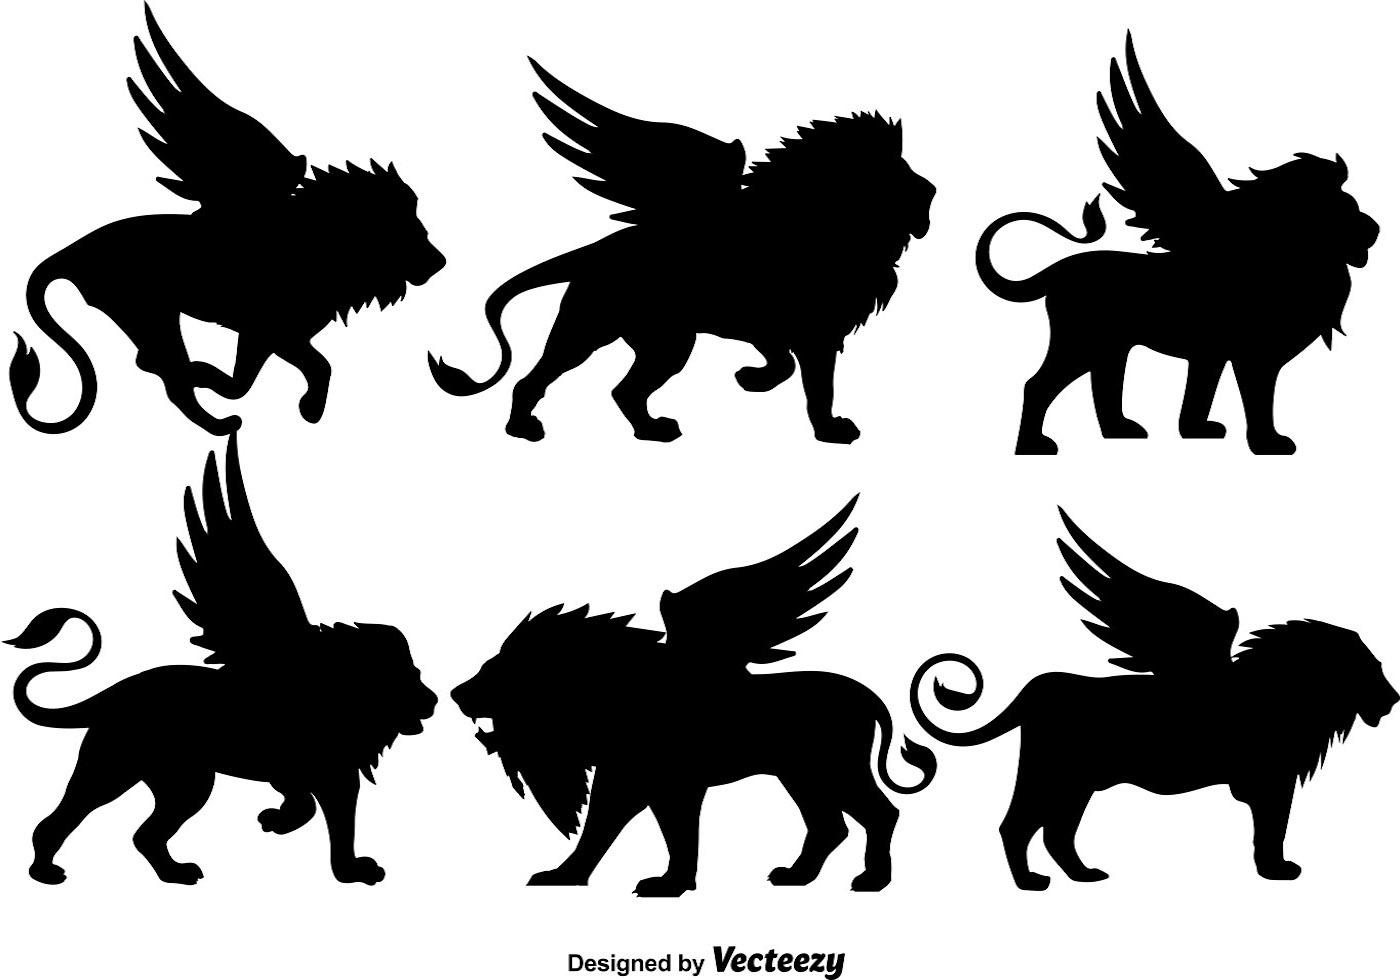 original animal silhouettes royalty free stock photos